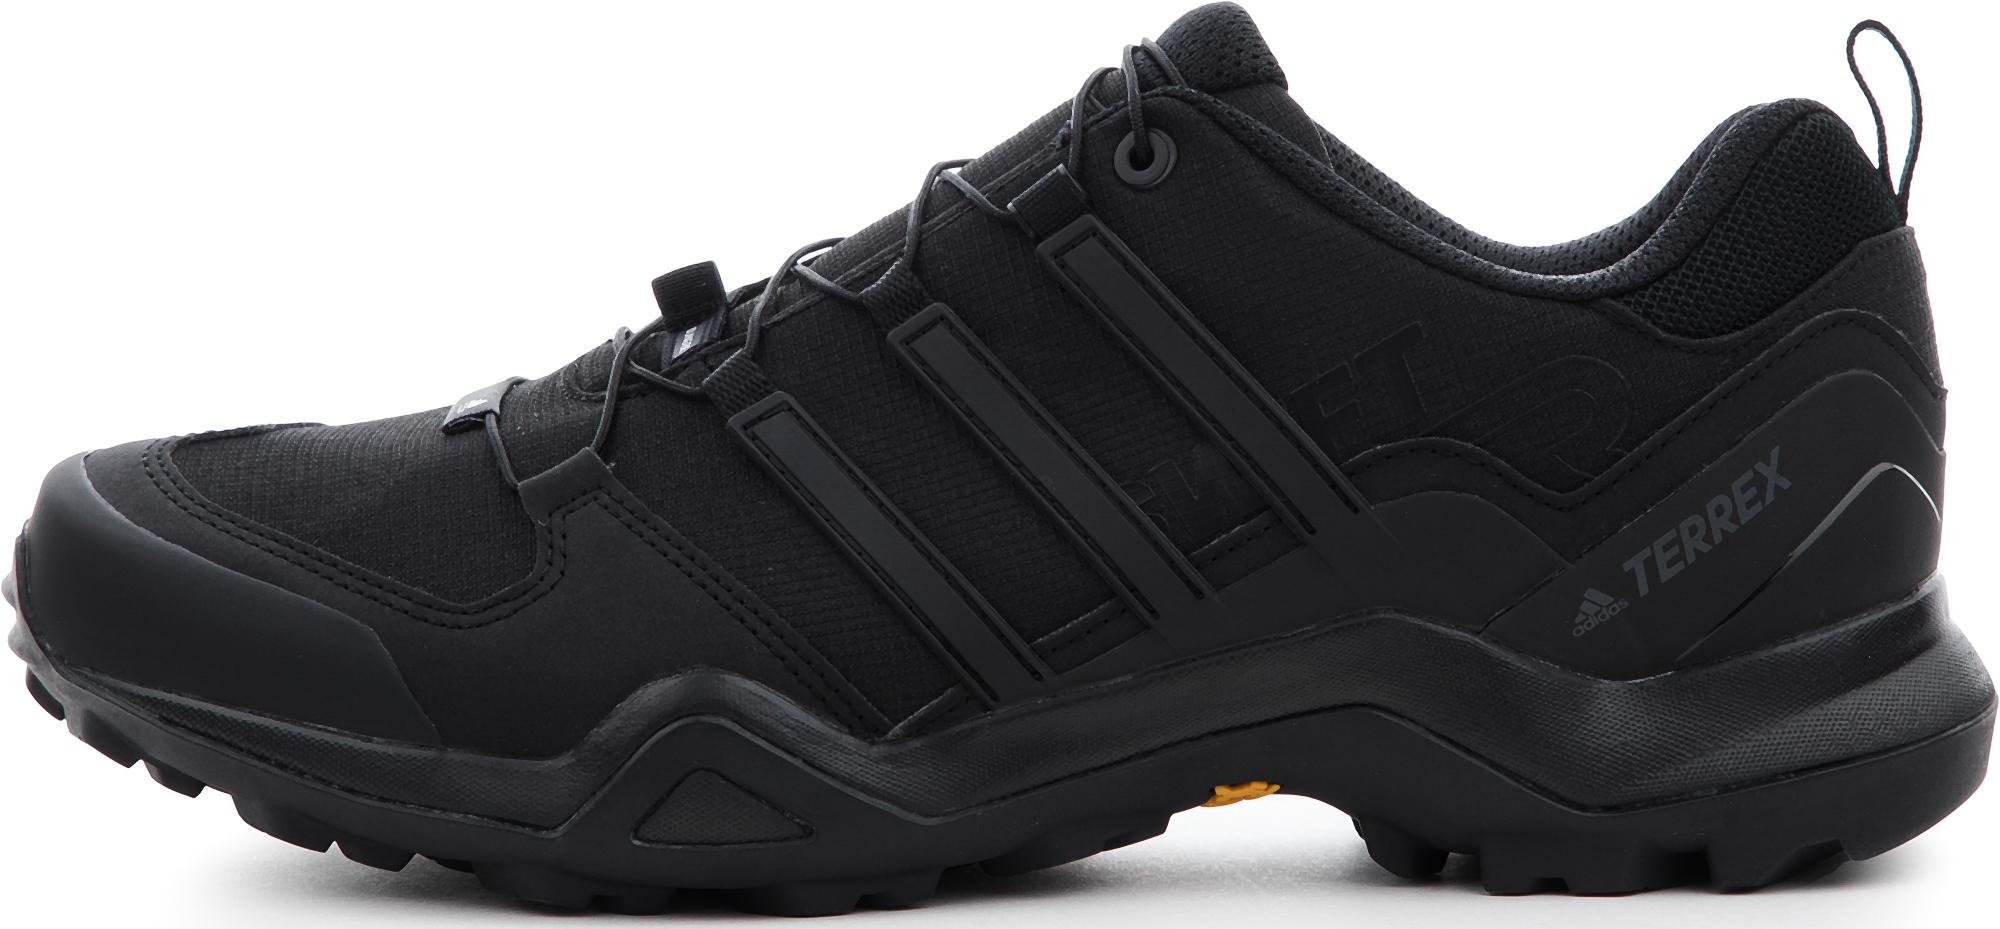 Adidas Полуботинки мужские Adidas Terrex Swift R2, размер 42 adidas ботинки мужские adidas terrex tivid mid climaproof размер 40